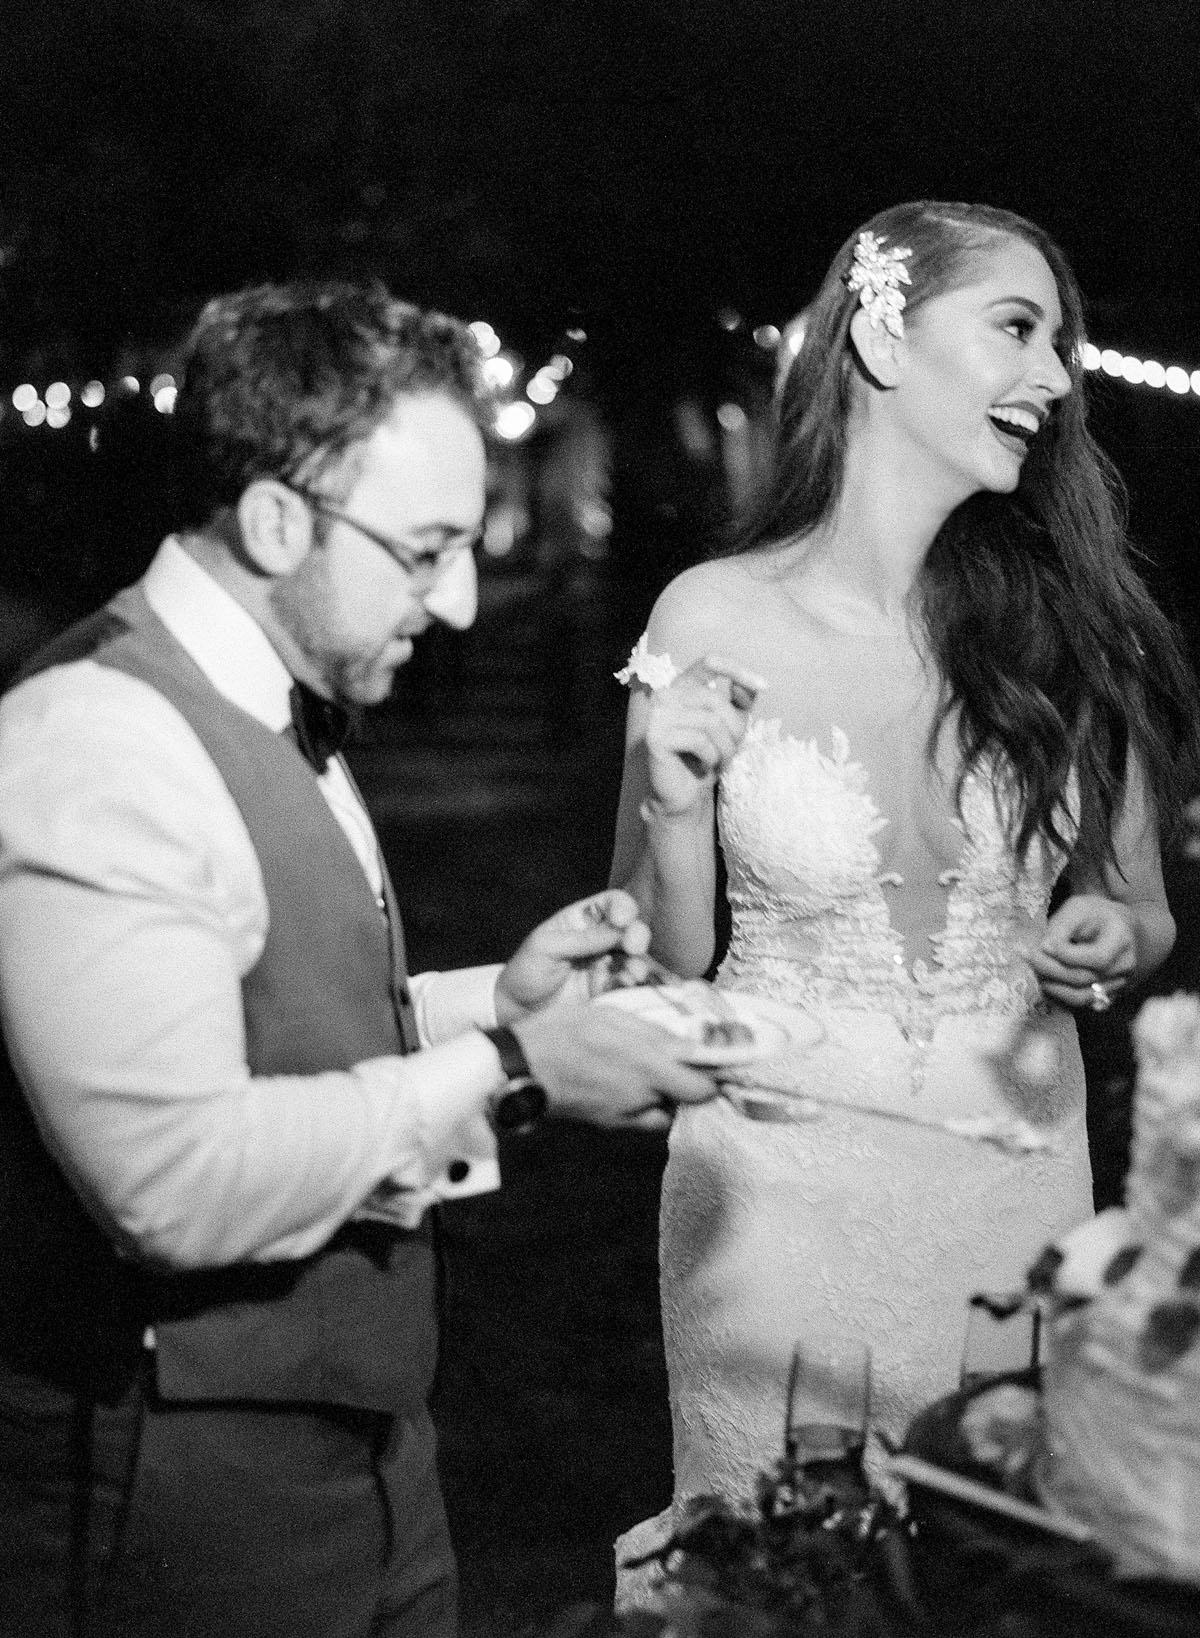 65-glam-bride-cake-cutting.jpg